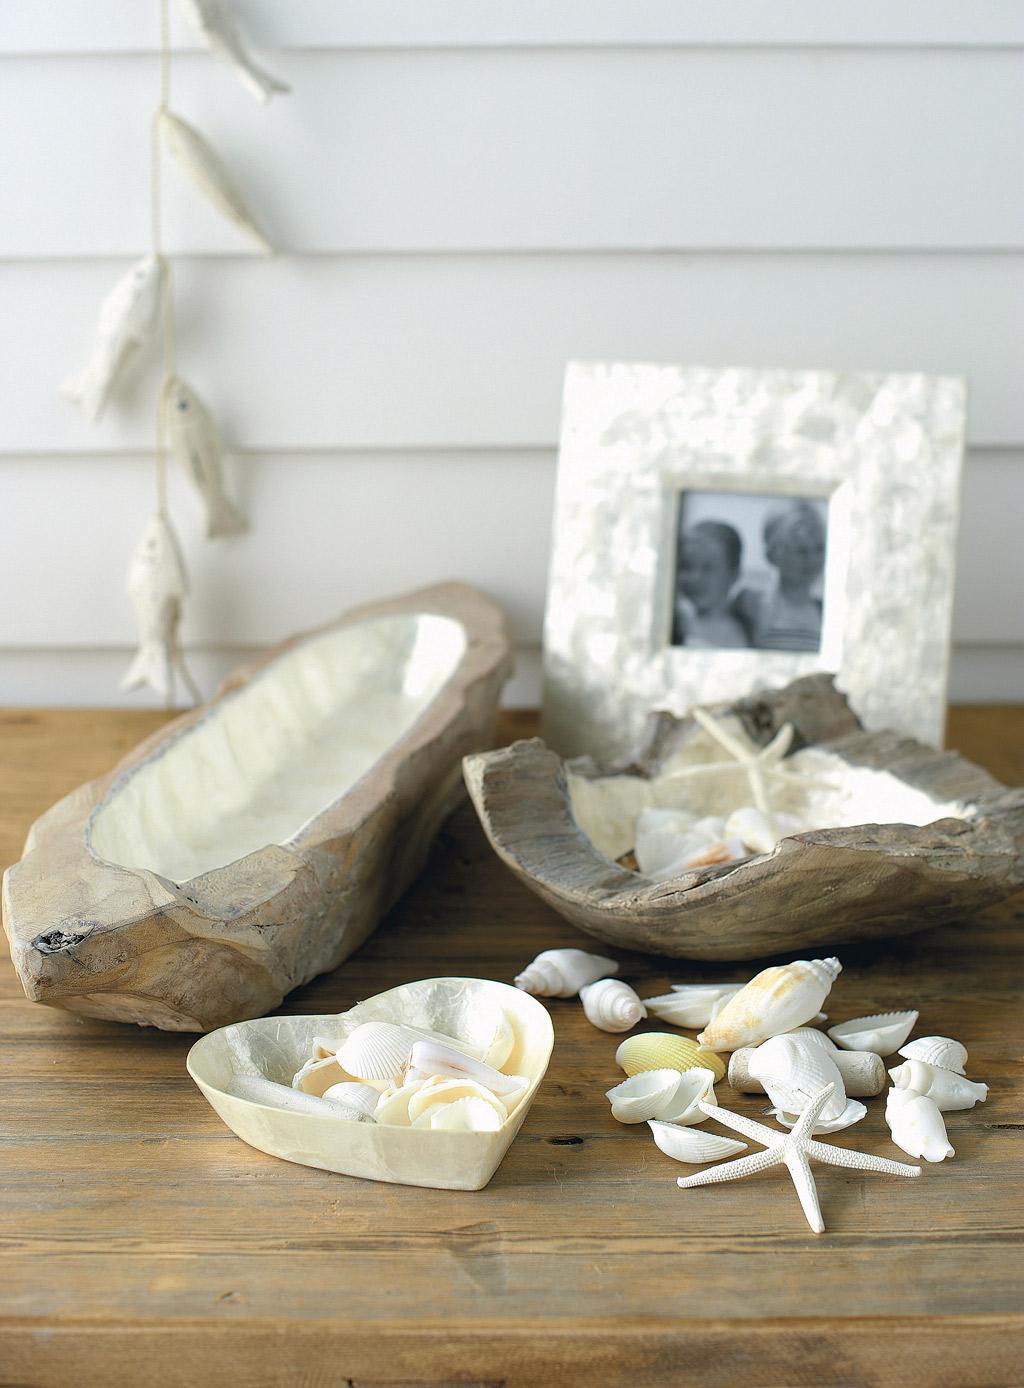 C mo decorar con conchas de mar - Decoracion con conchas ...